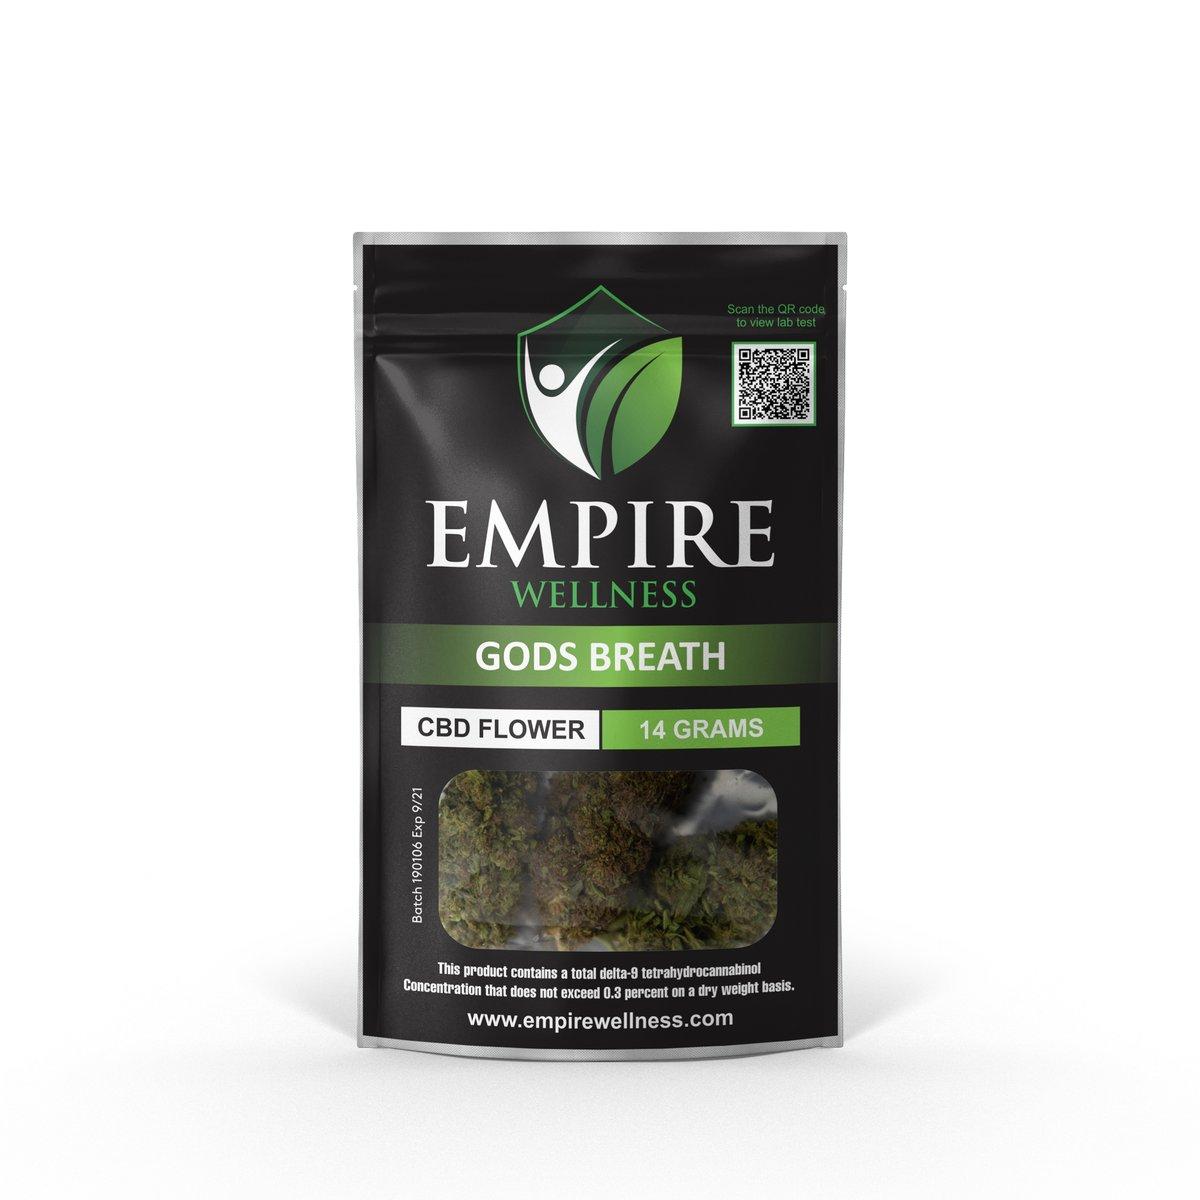 Empire Wellness Launches new CBD Flower Strains 11